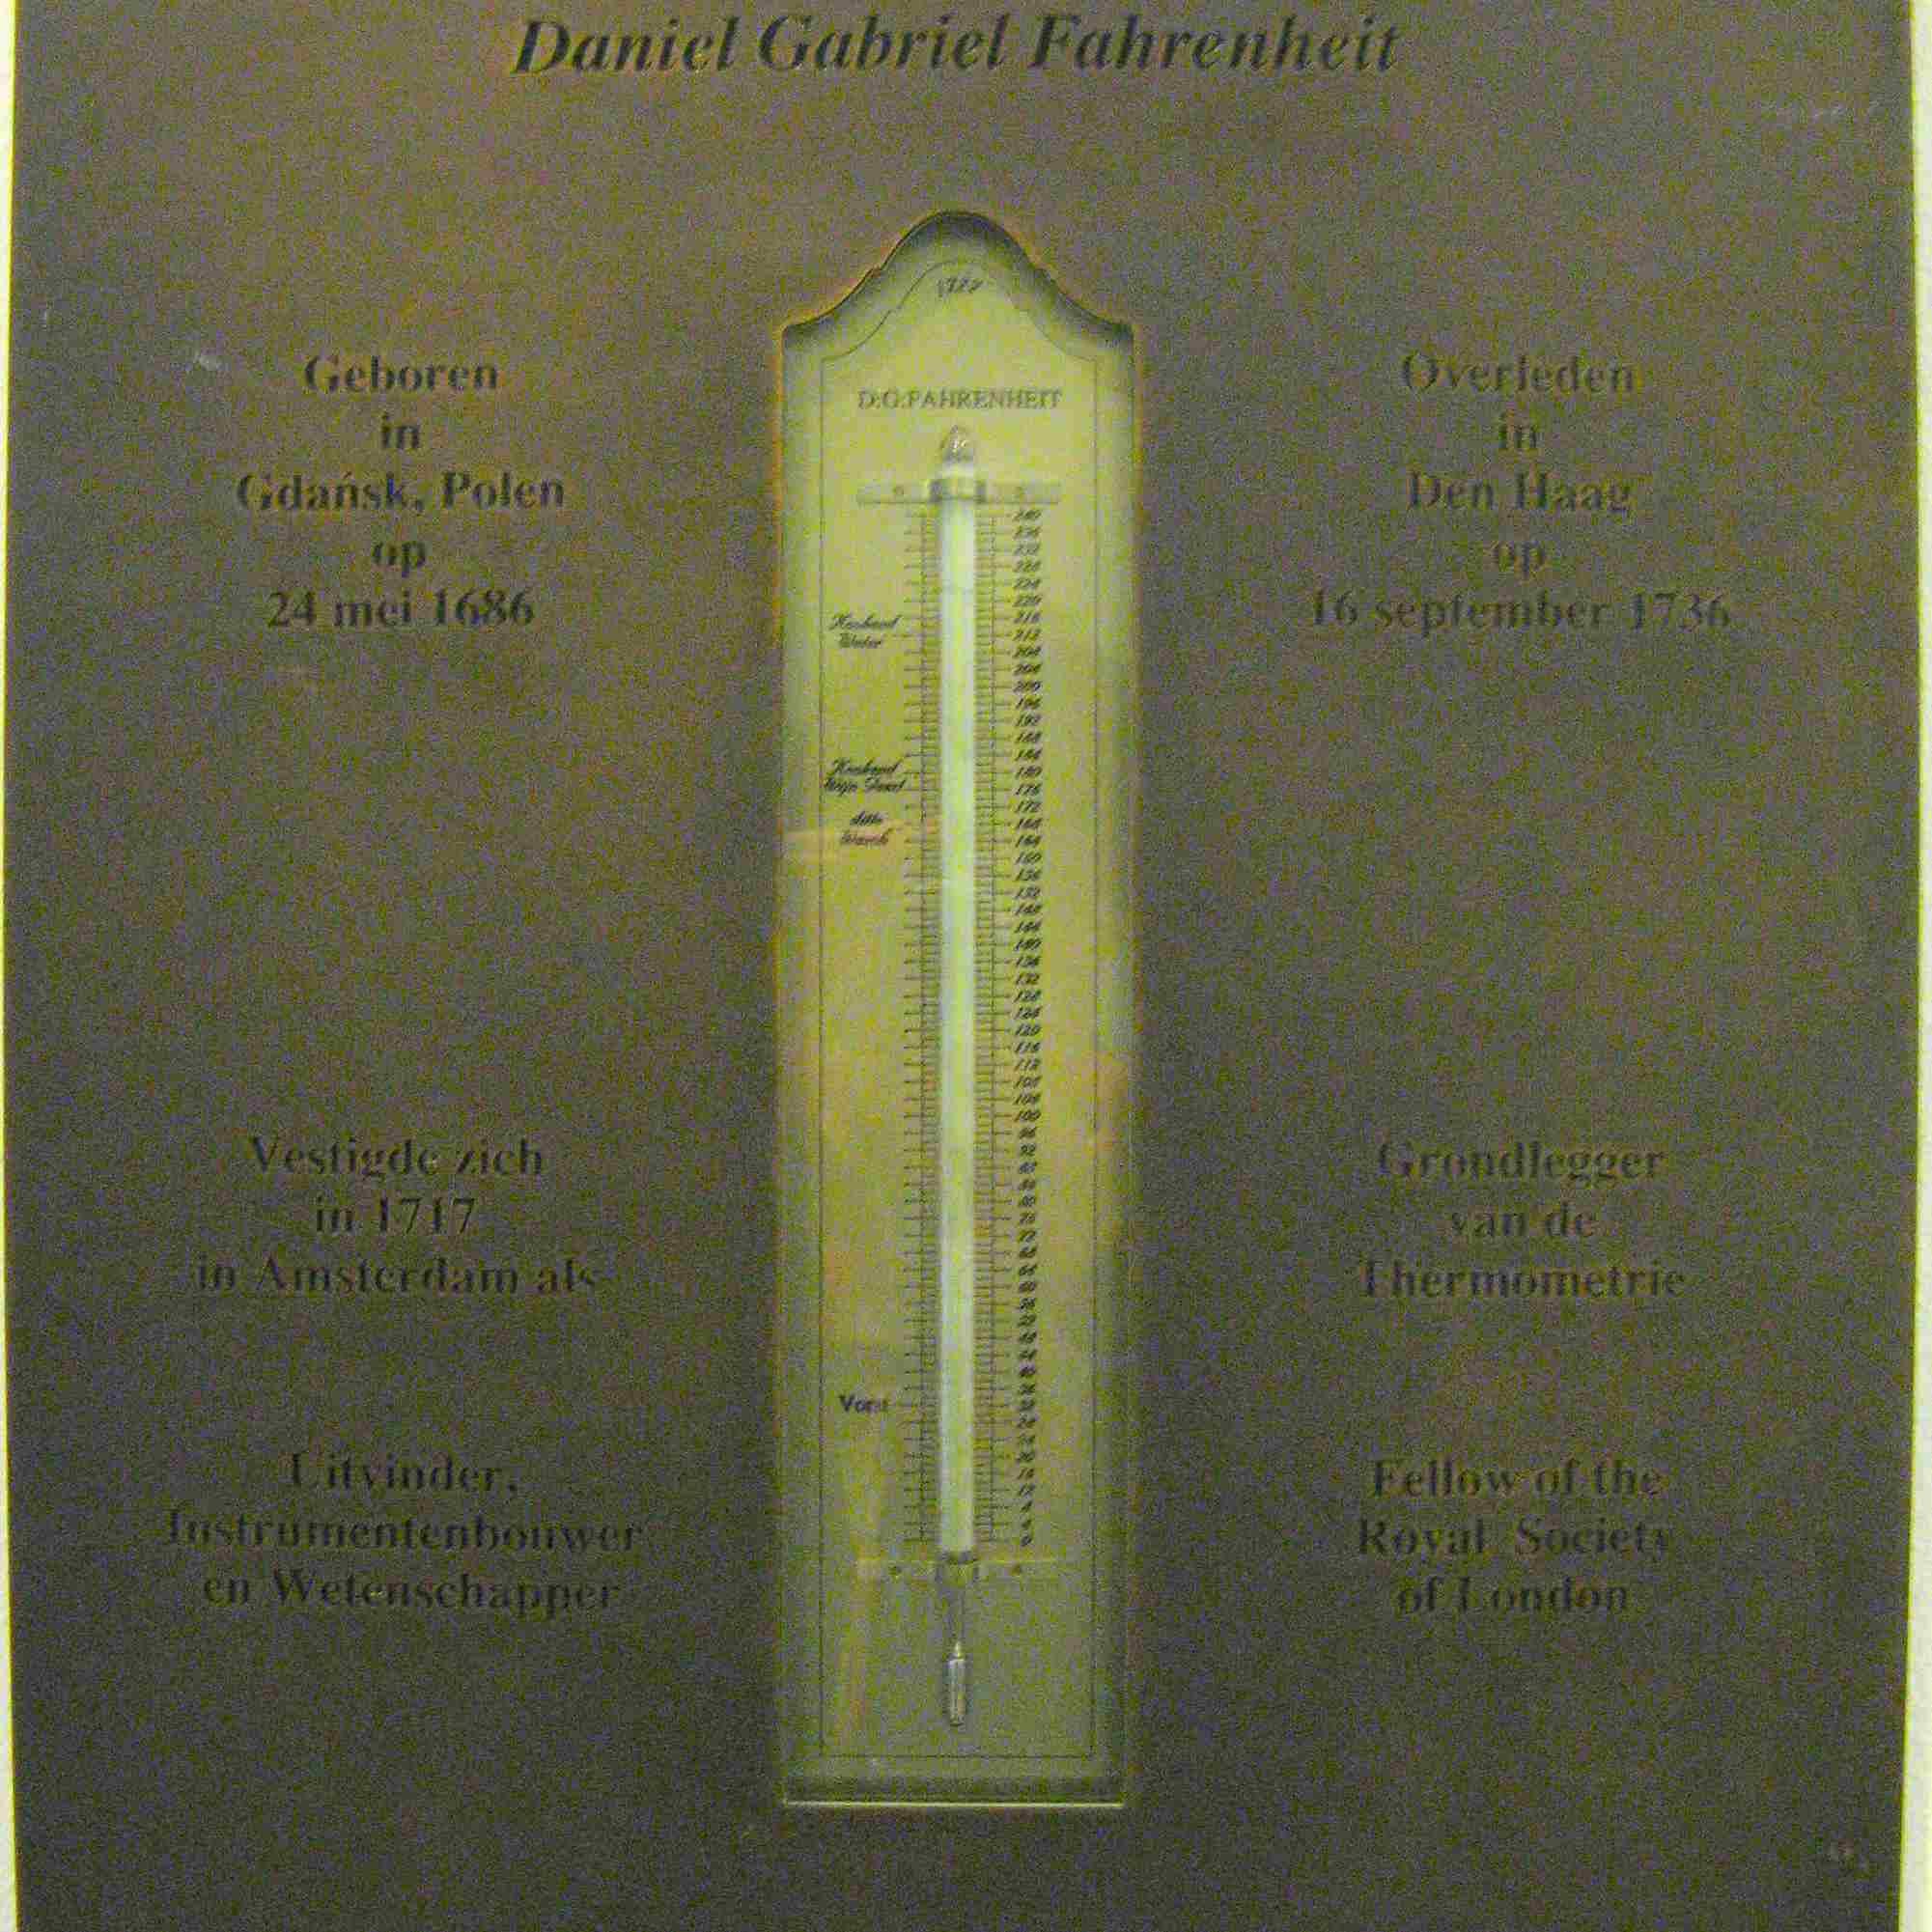 Memorial plaque dedicated to D.G. Fahrenheit.